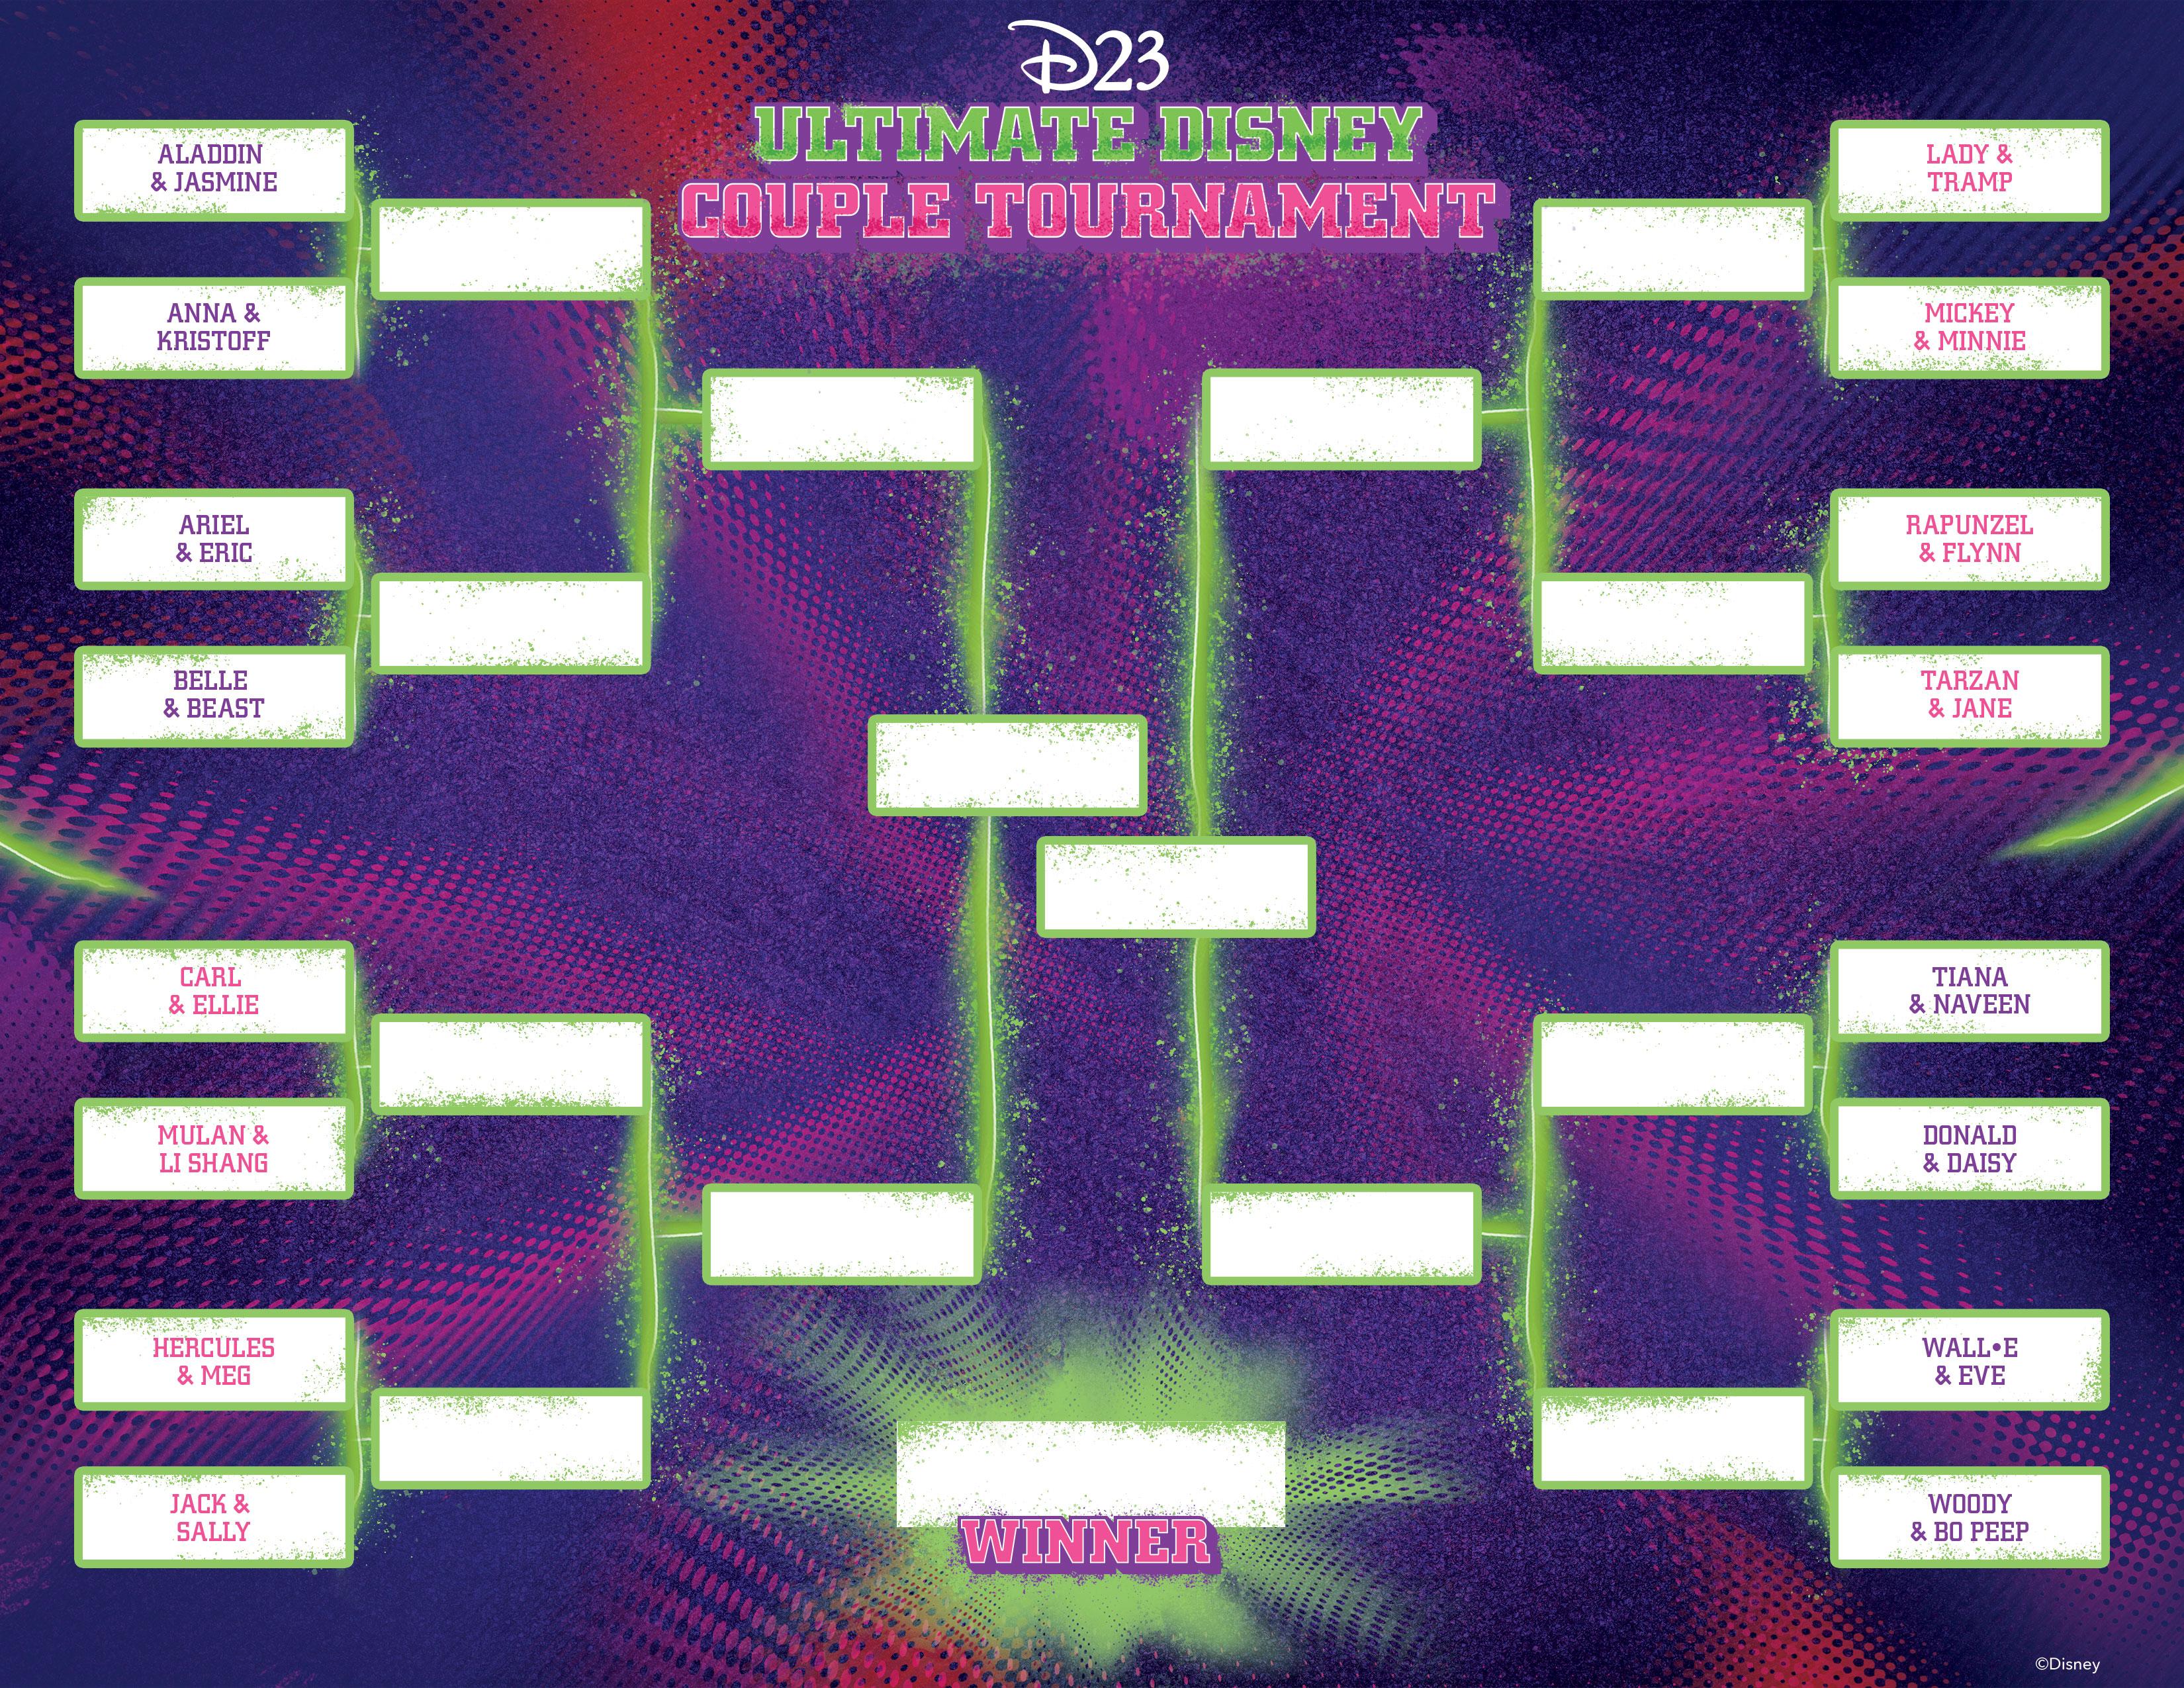 Ultimate Disney Couples Tournament bracket